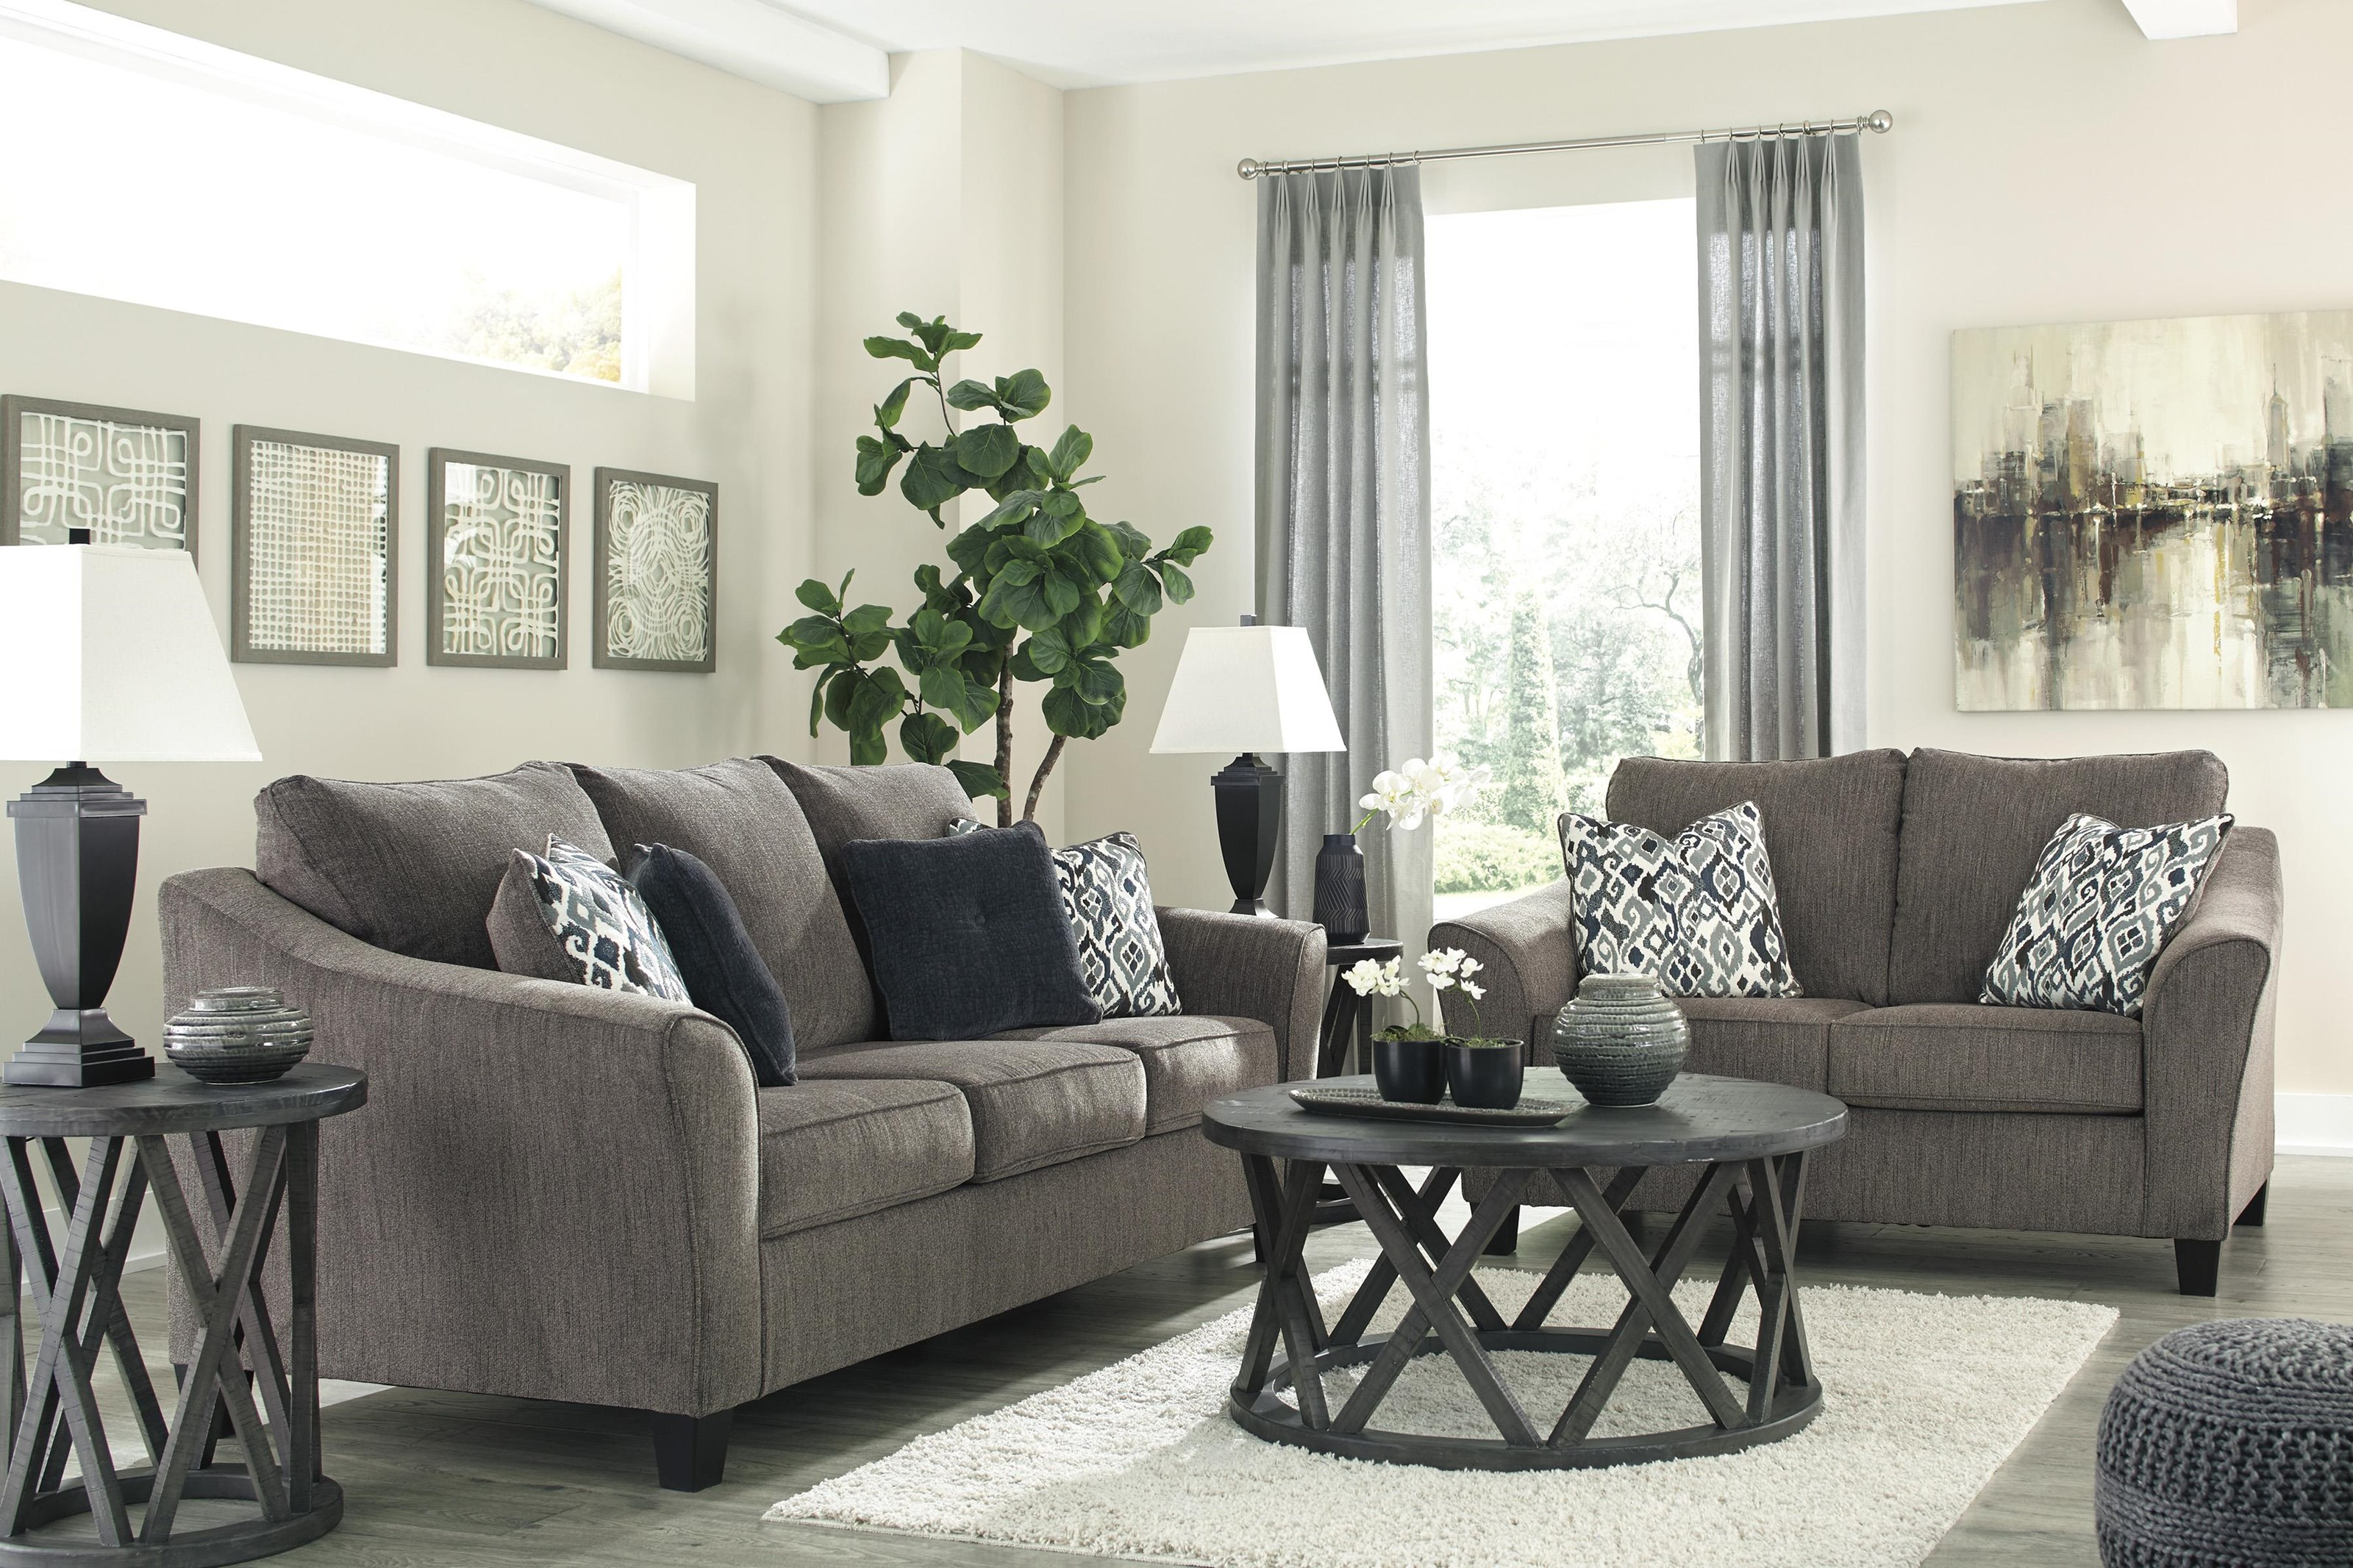 Nemoli Sofa and Loveseat Set by Signature Design by Ashley at Sam Levitz Outlet